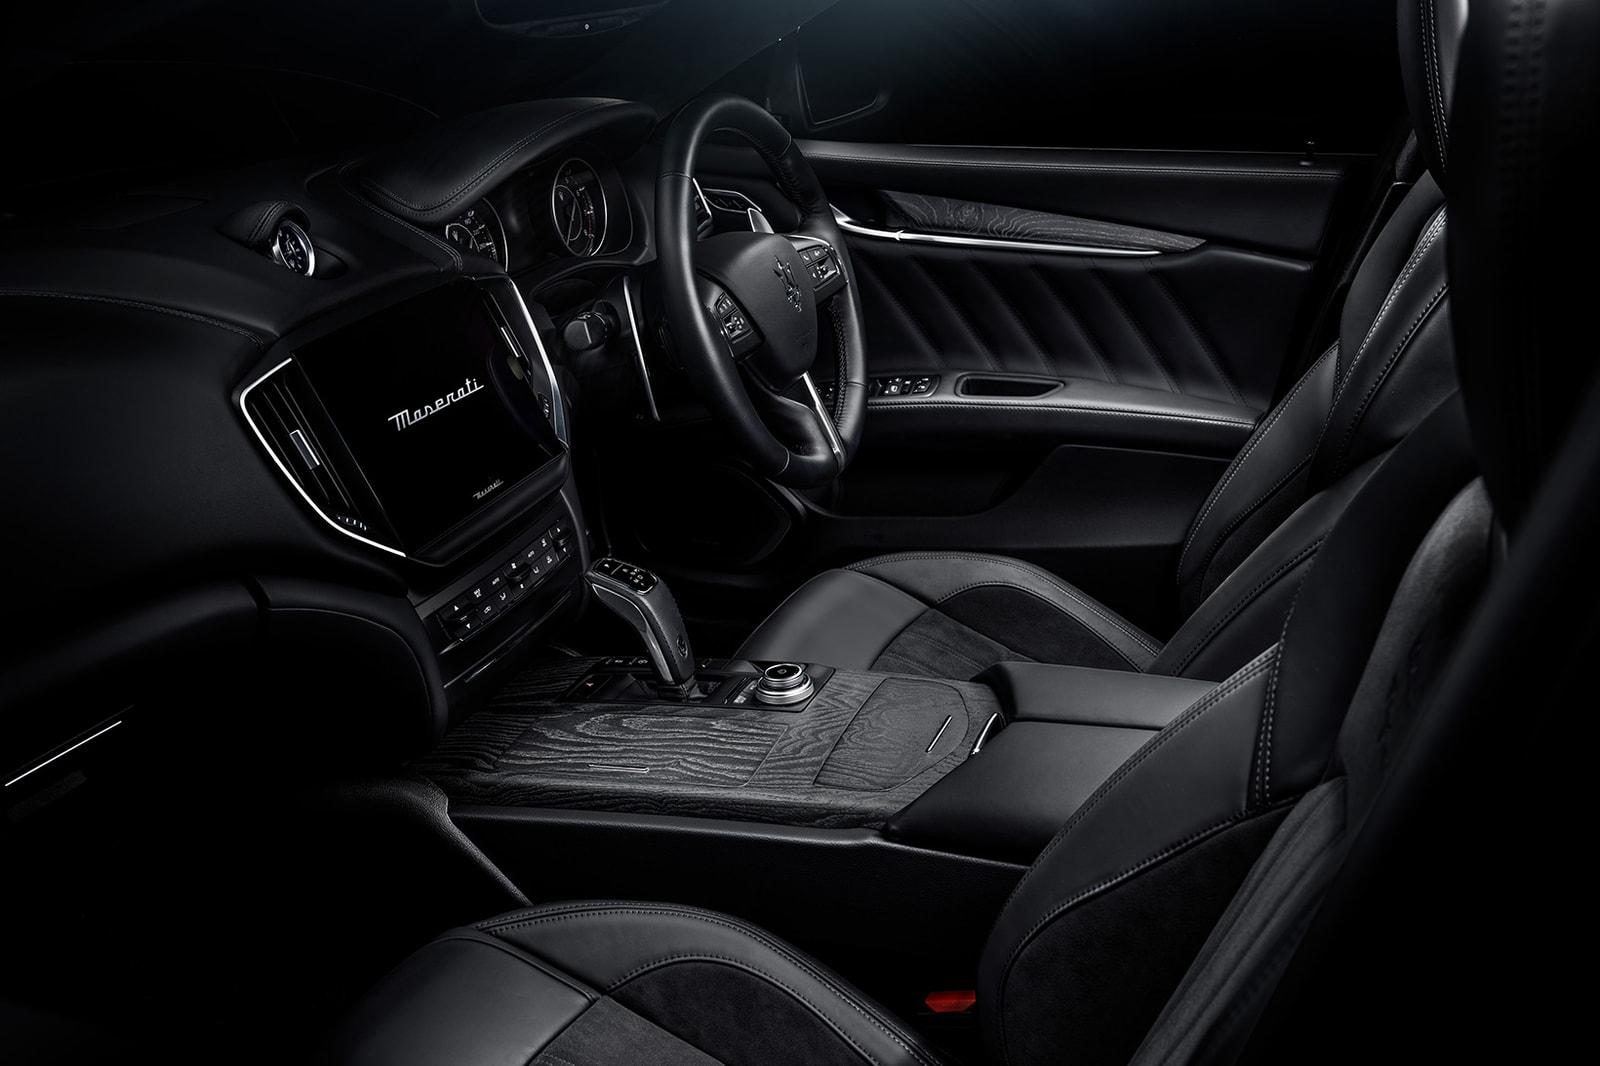 Maserati fragment design Limited Edition Car Hiroshi Fujiwara Ghibli Operanera Ghibli Operabianca,